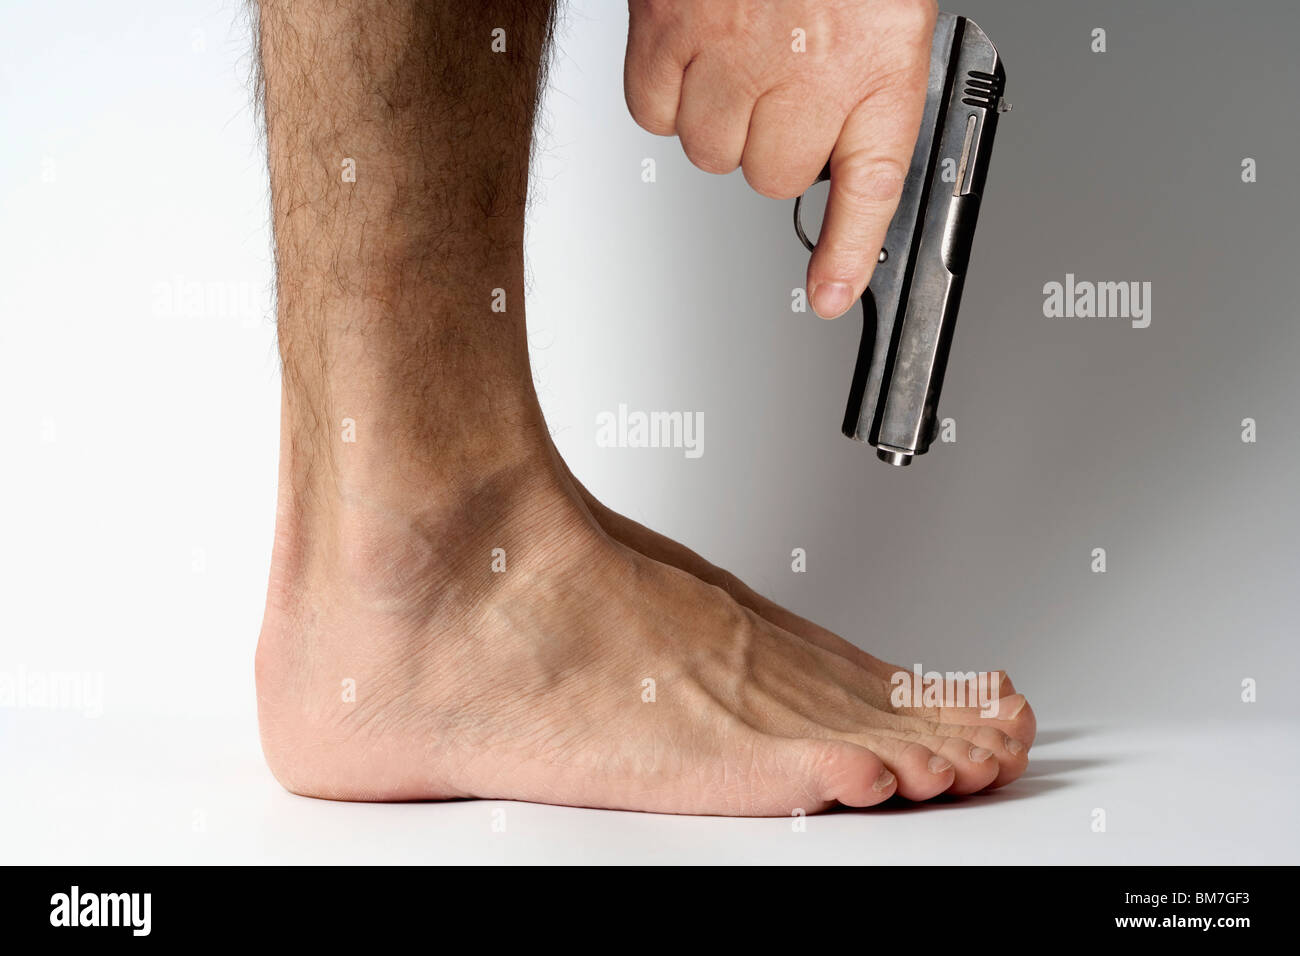 Selbst in den Fuß schießen Stockbild